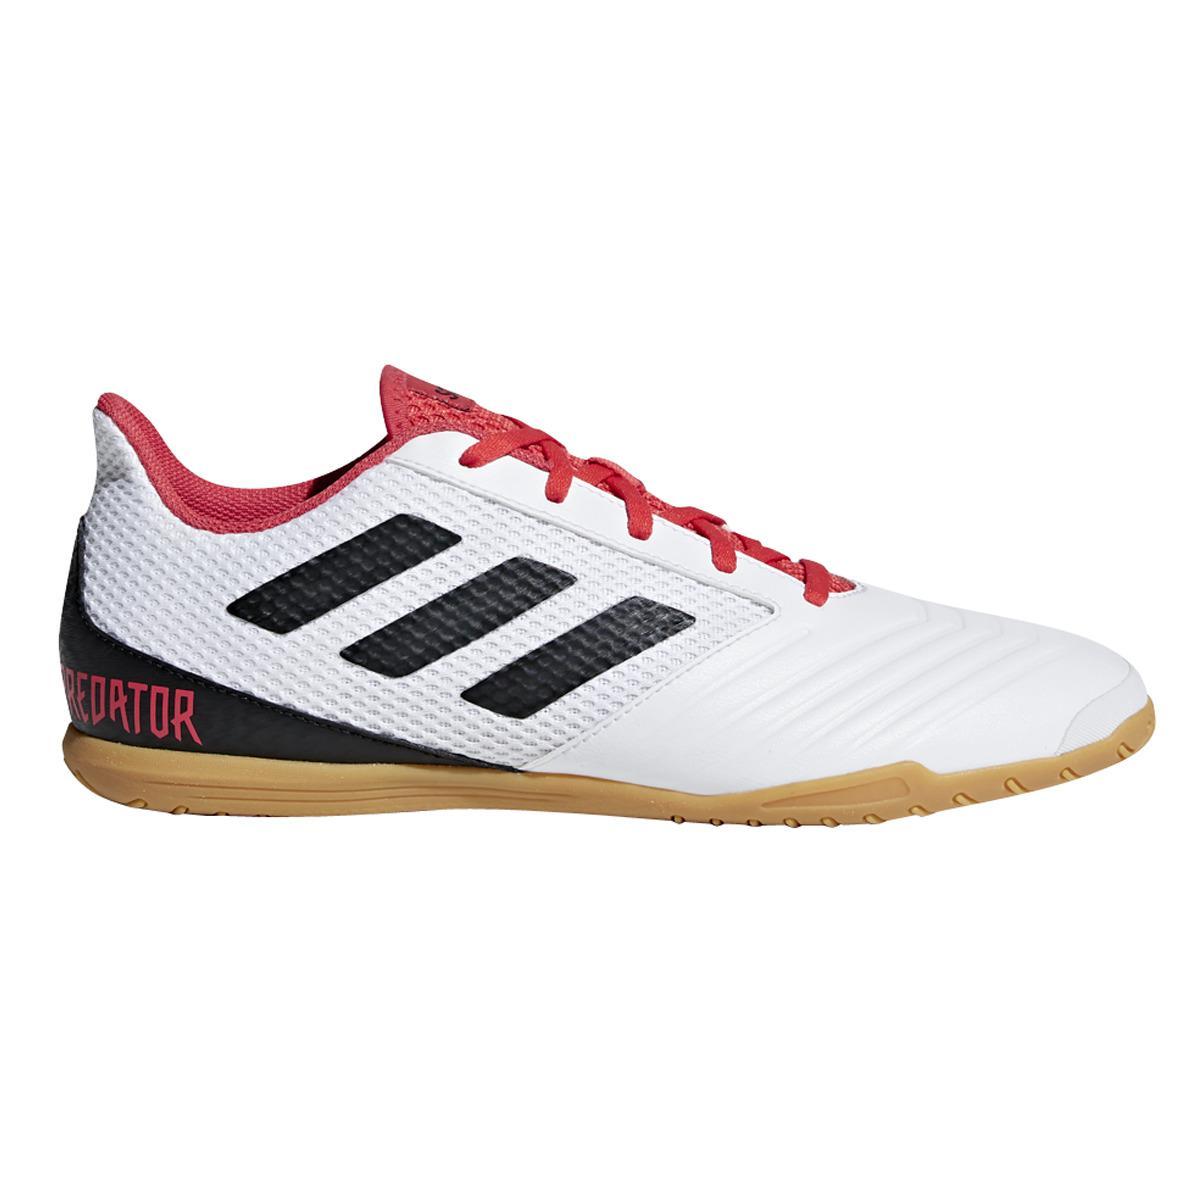 1ca540ba600c adidas Predator Tango 18.4 Sala Indoor Football Trainers in White ...